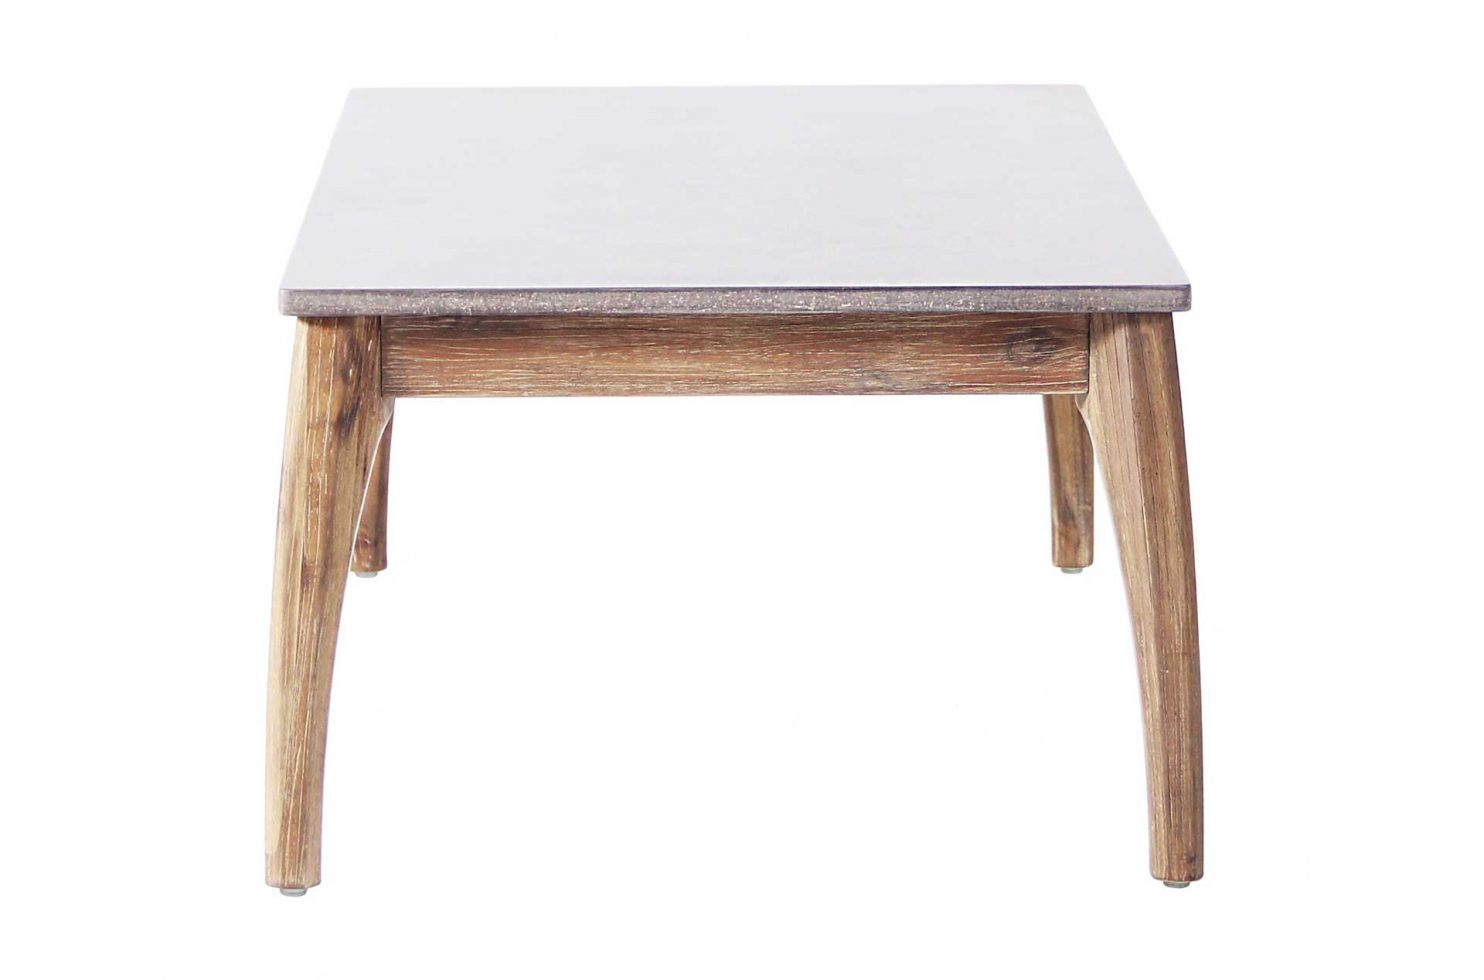 wings coffee table E50499003 1 side web